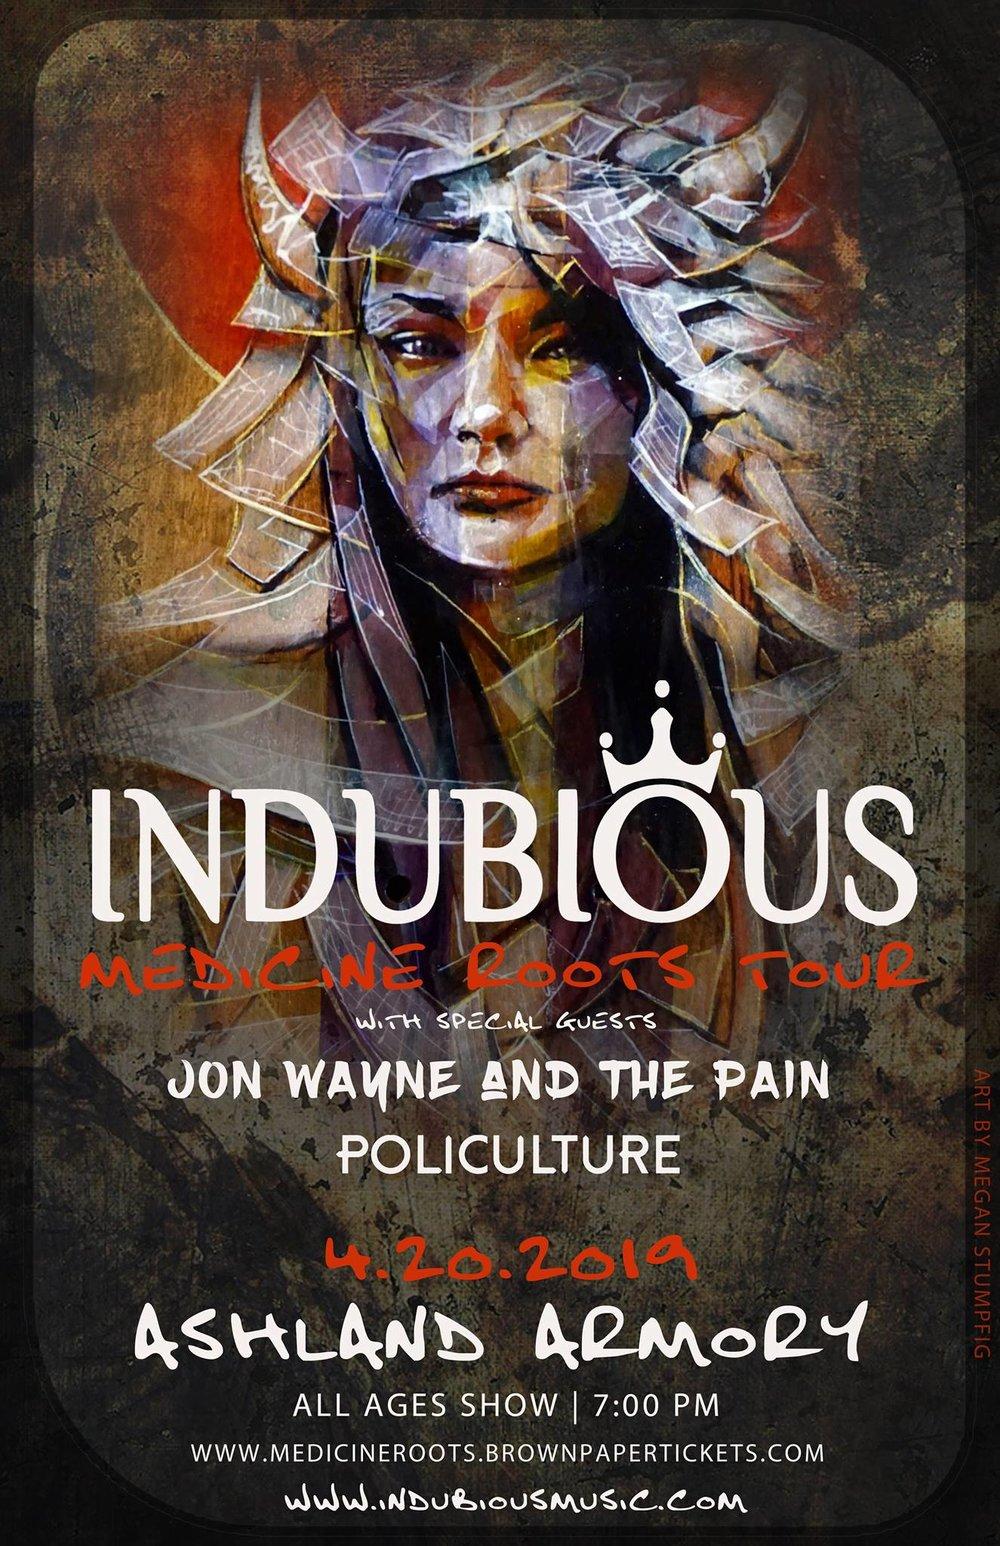 indubious-4-20-18.jpg